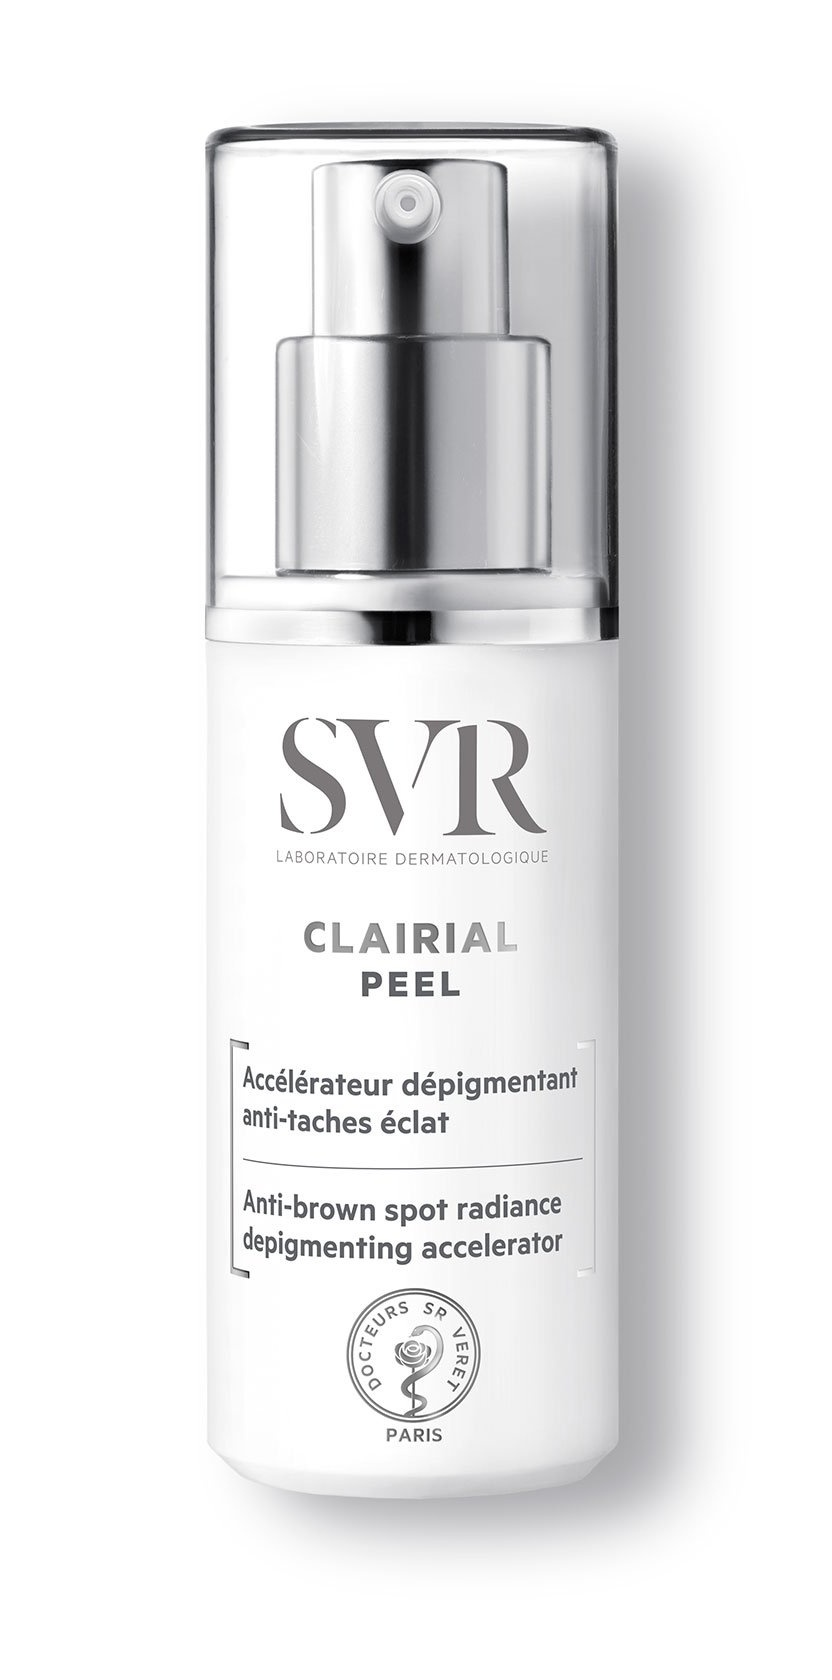 SVR Clairial Peel